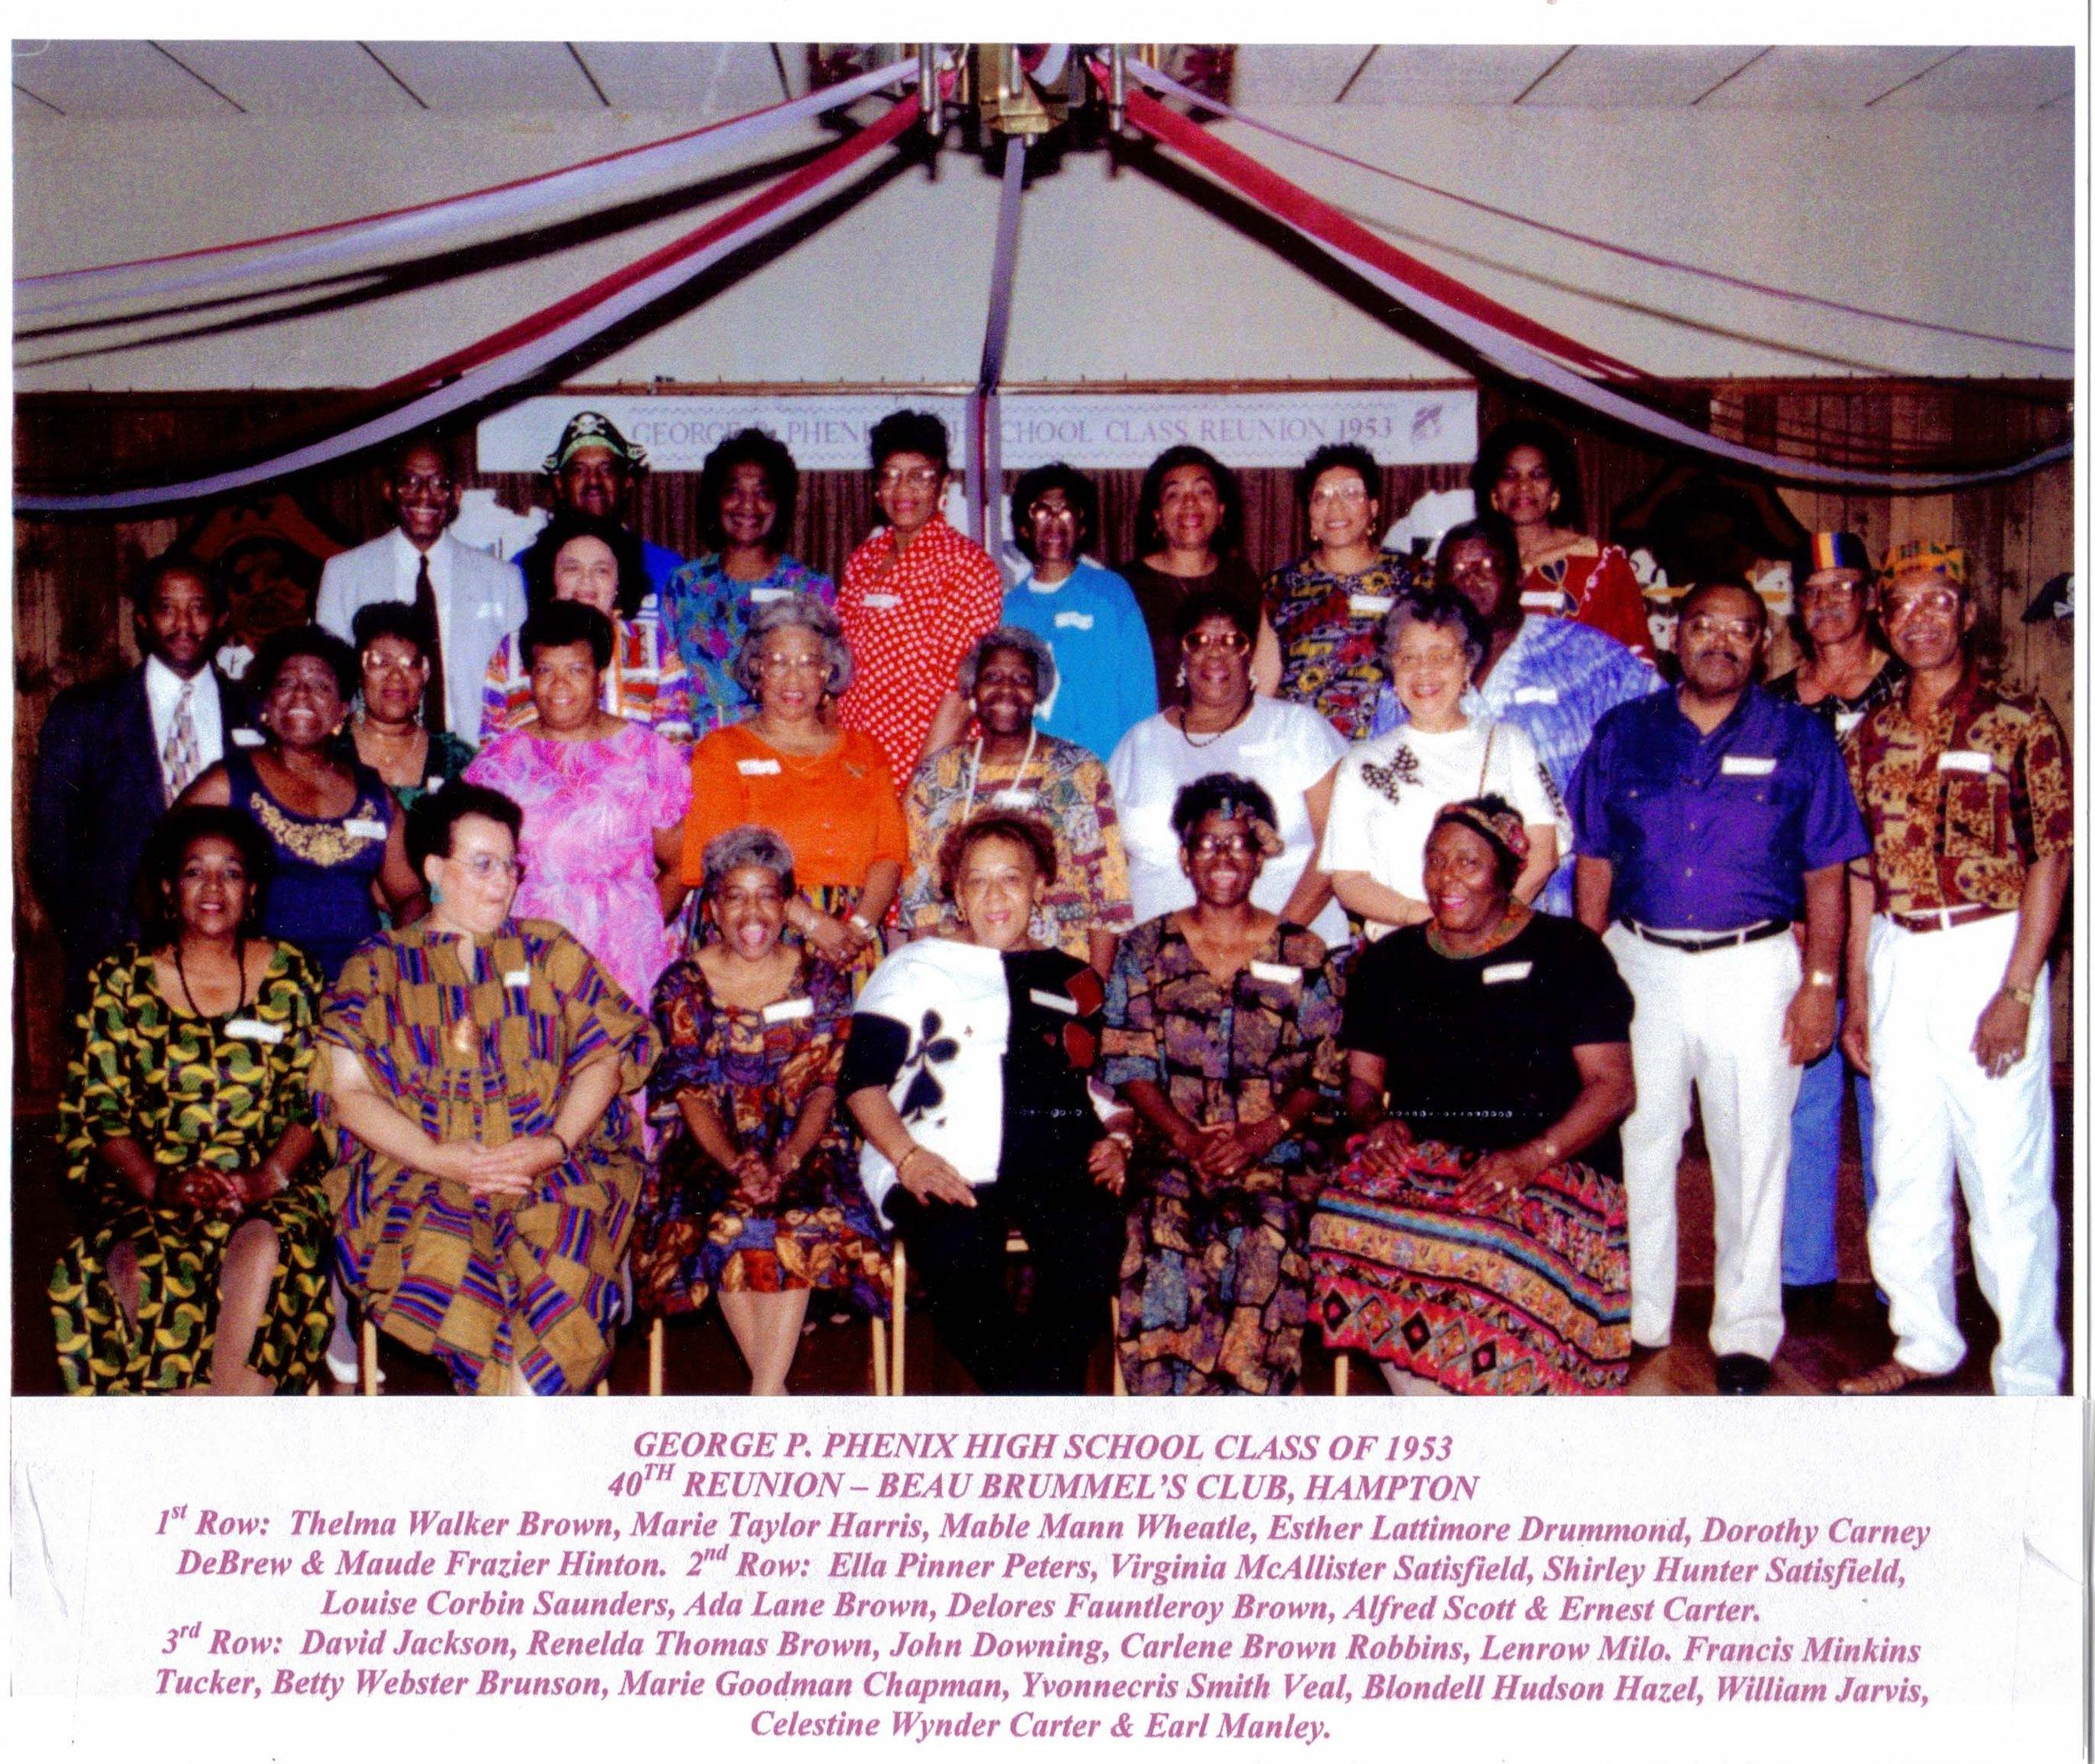 40th Reunion, Class of 1953